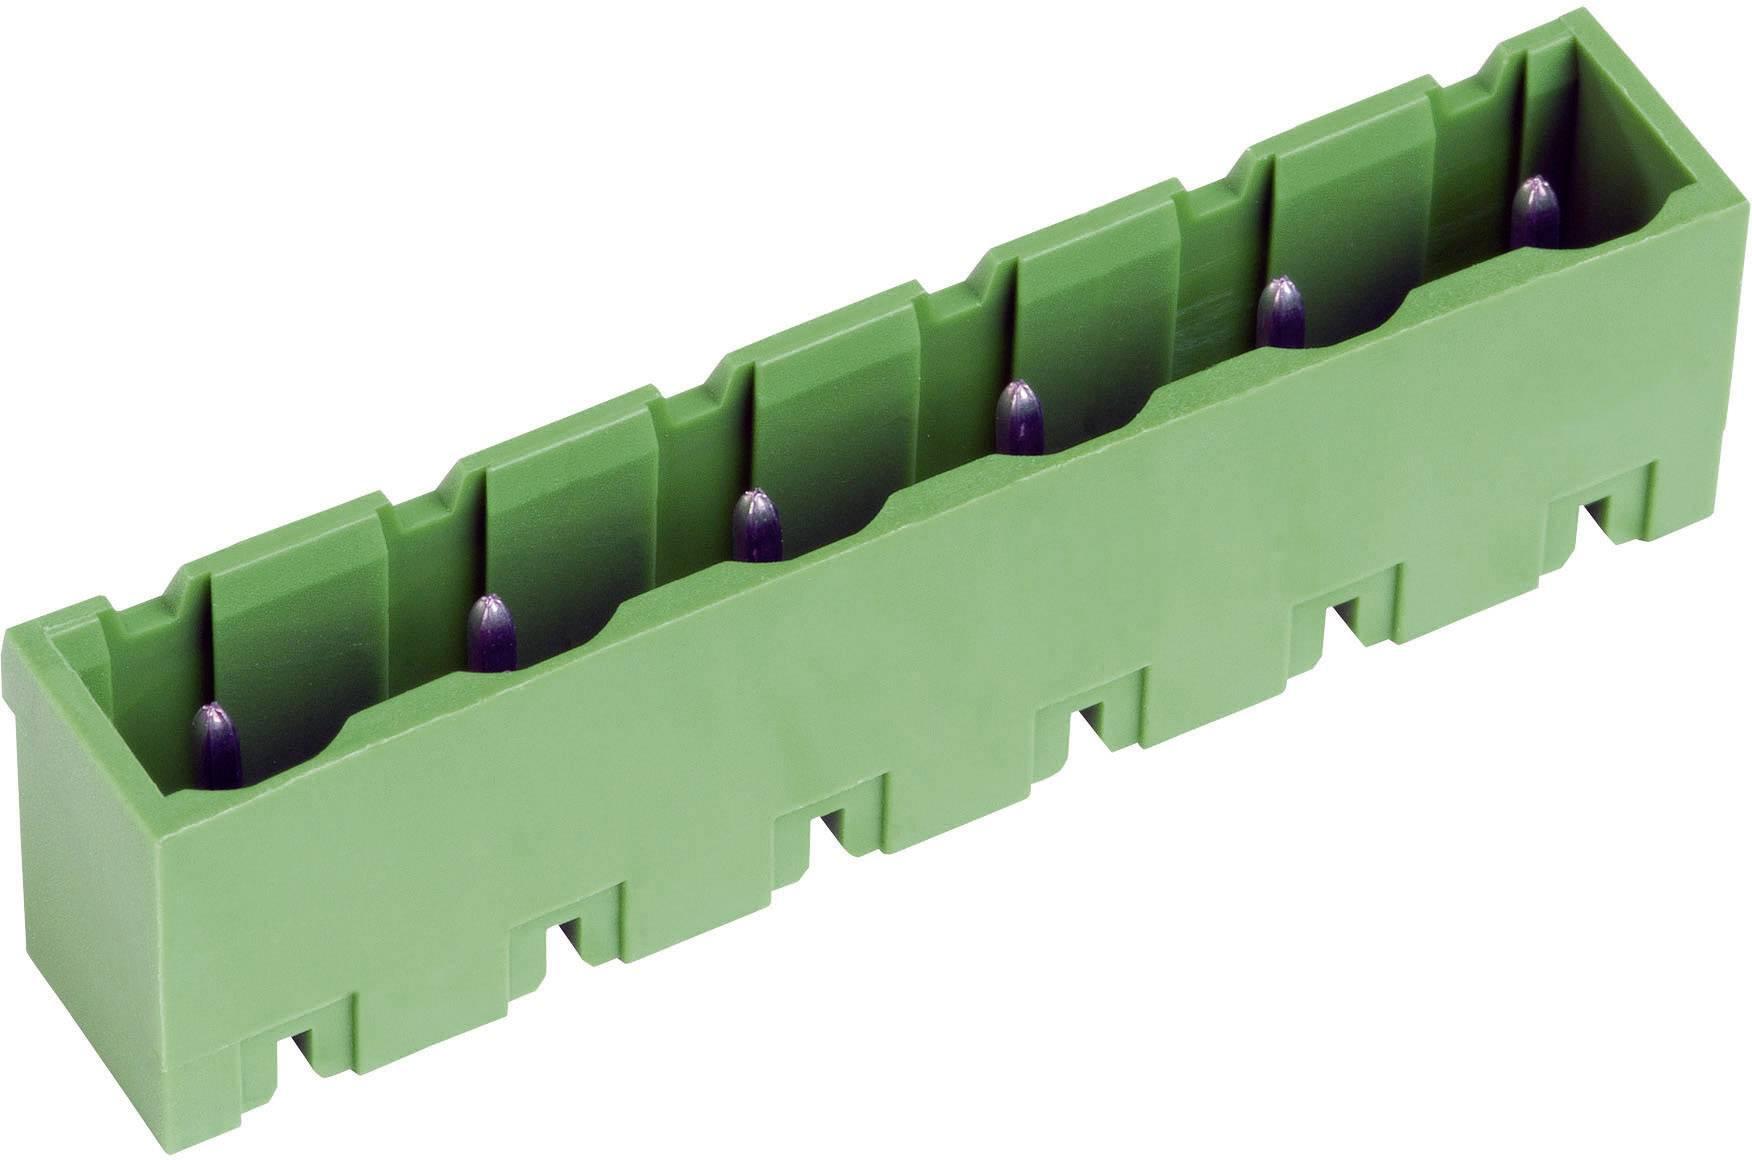 Konektor do DPS PTR STLZ960/7G-7.62-V 50960075121D, 53.34 mm, pólů 7, rozteč 7.62 mm, 1 ks